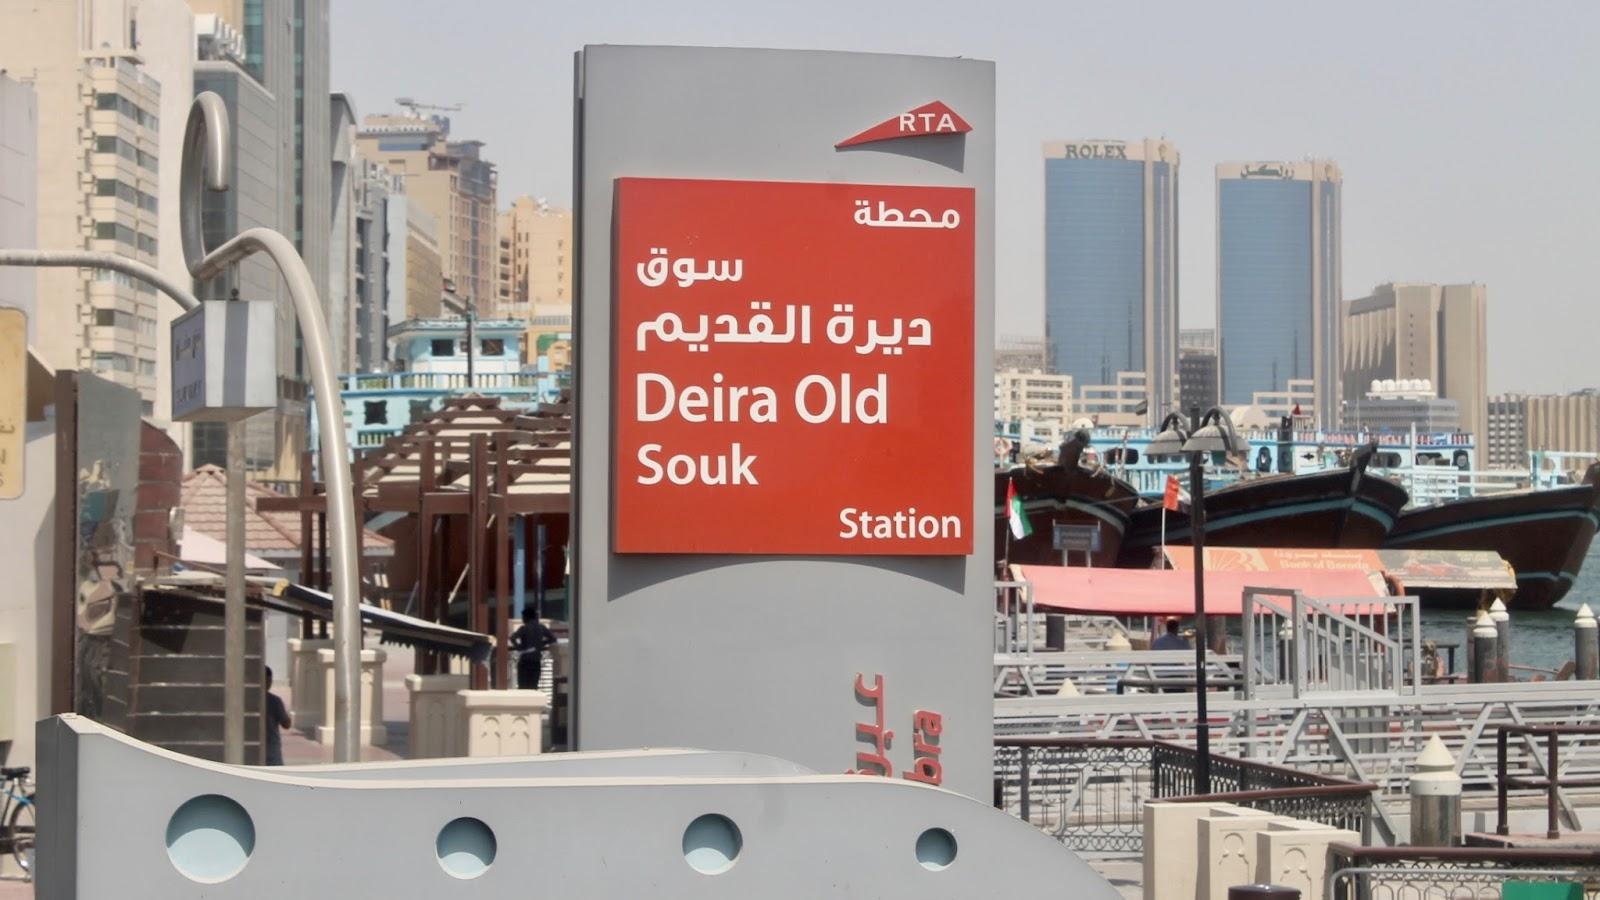 Dubai Deira Old Souks